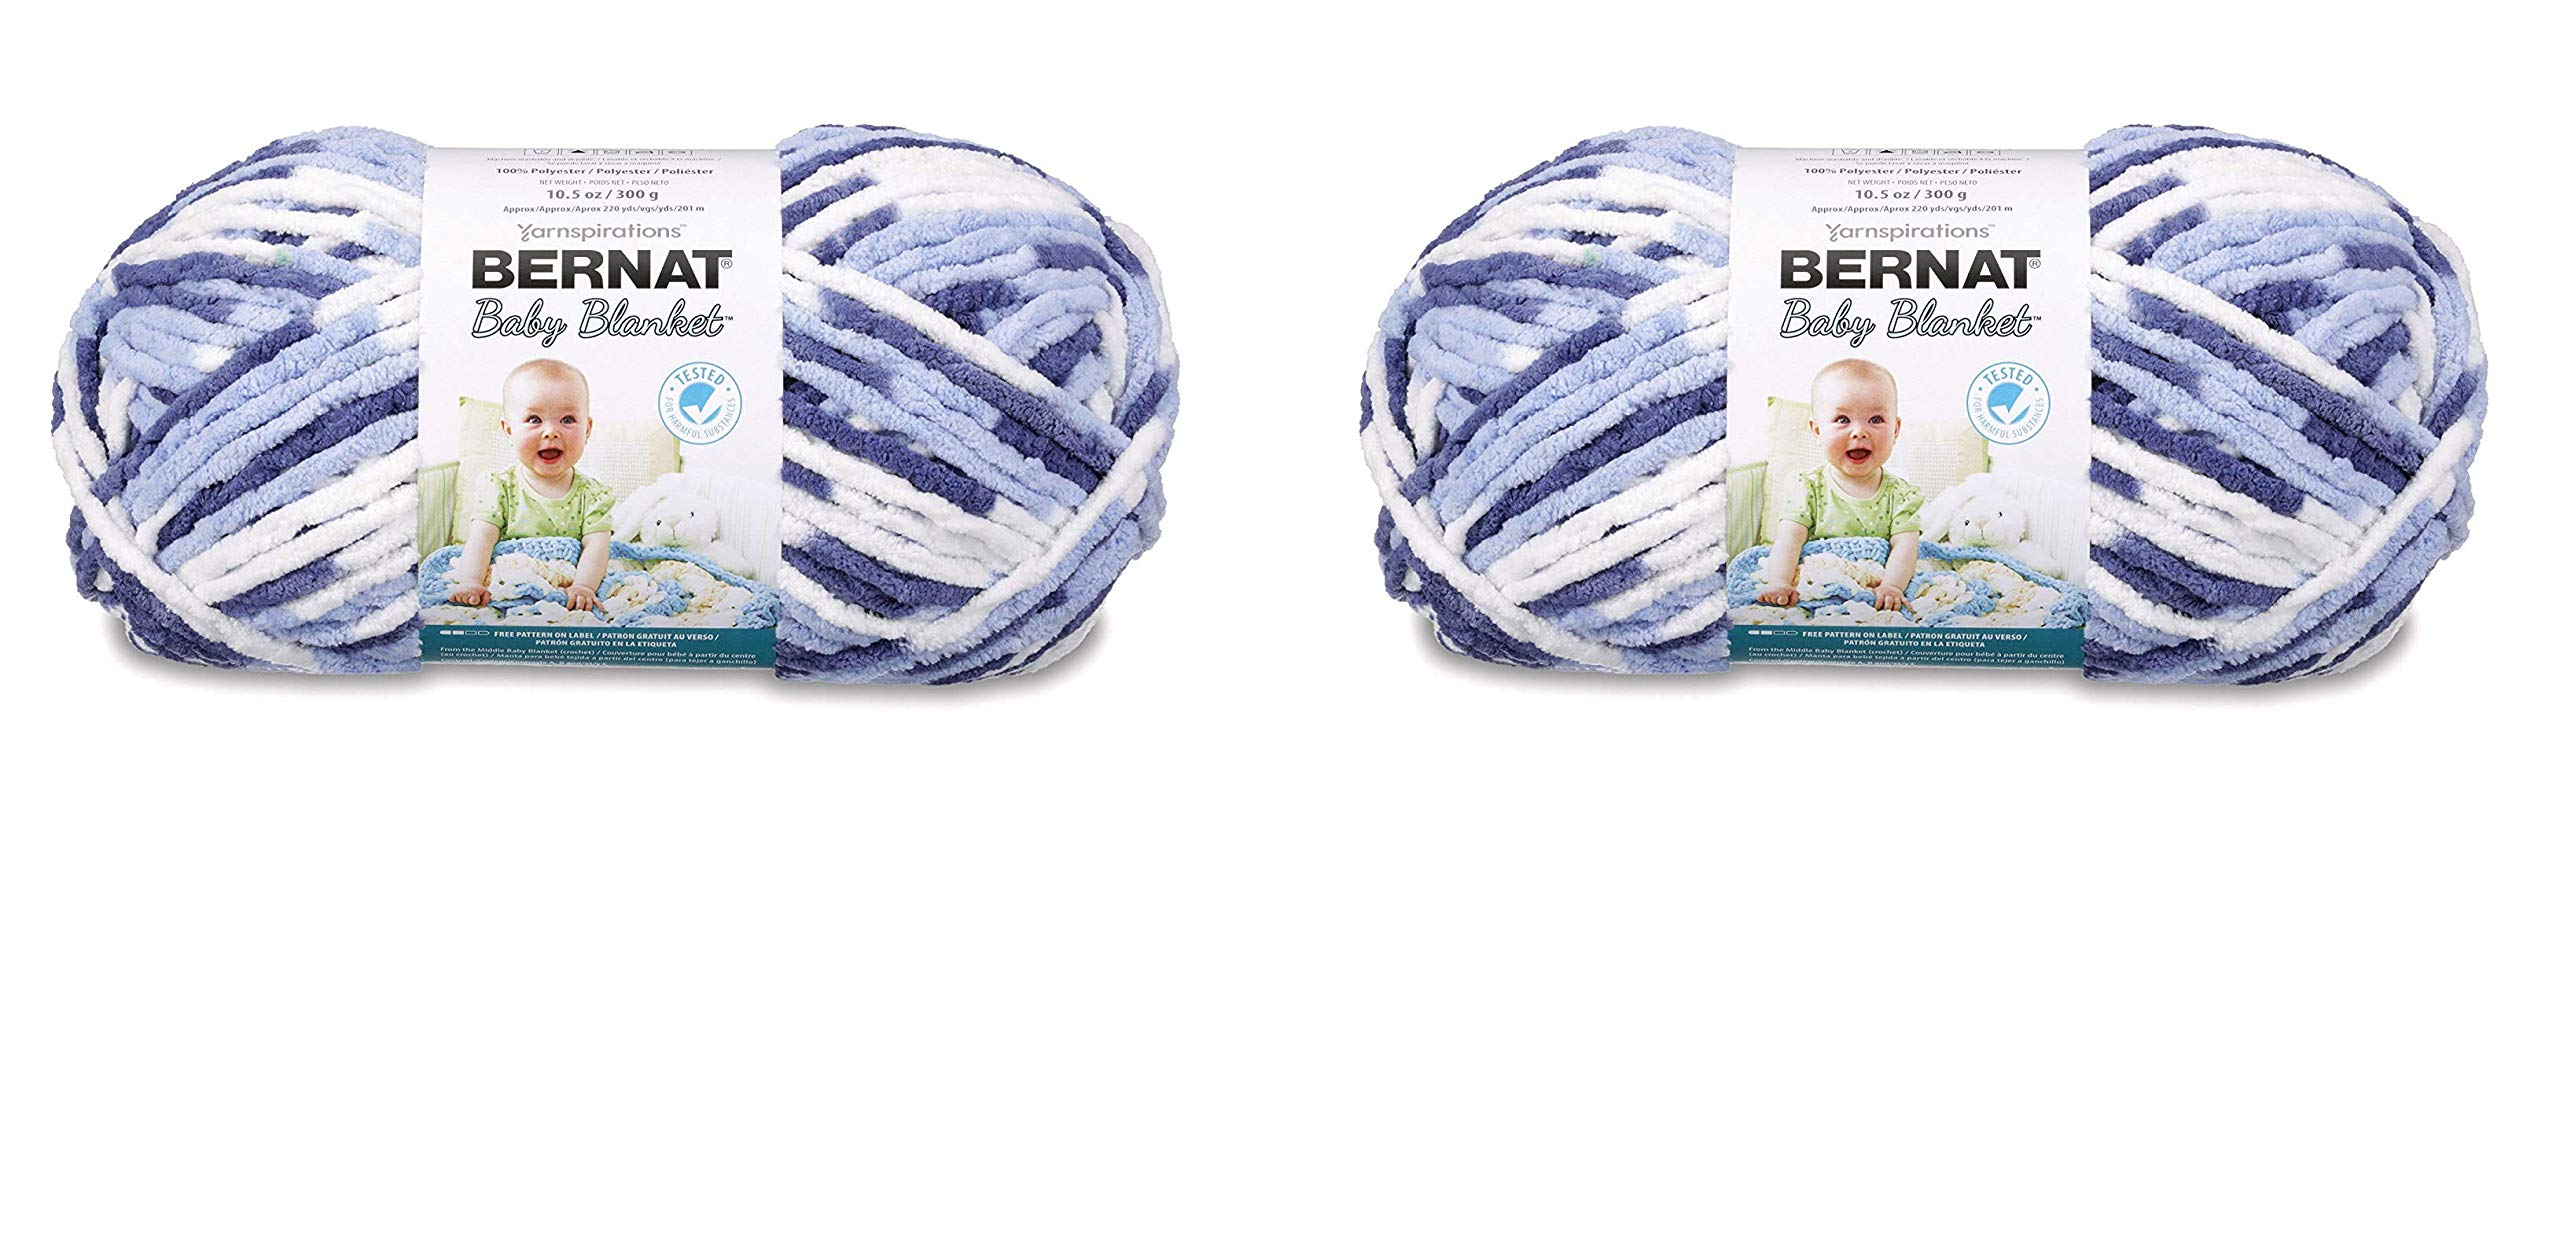 Bernat Baby Blanket Yarn - (6) Super Bulky Gauge - 10.5 oz - Blue Dreams - Single Ball Machine Wash & Dry (16110404134) (2-Pack) by Bernat (Image #1)